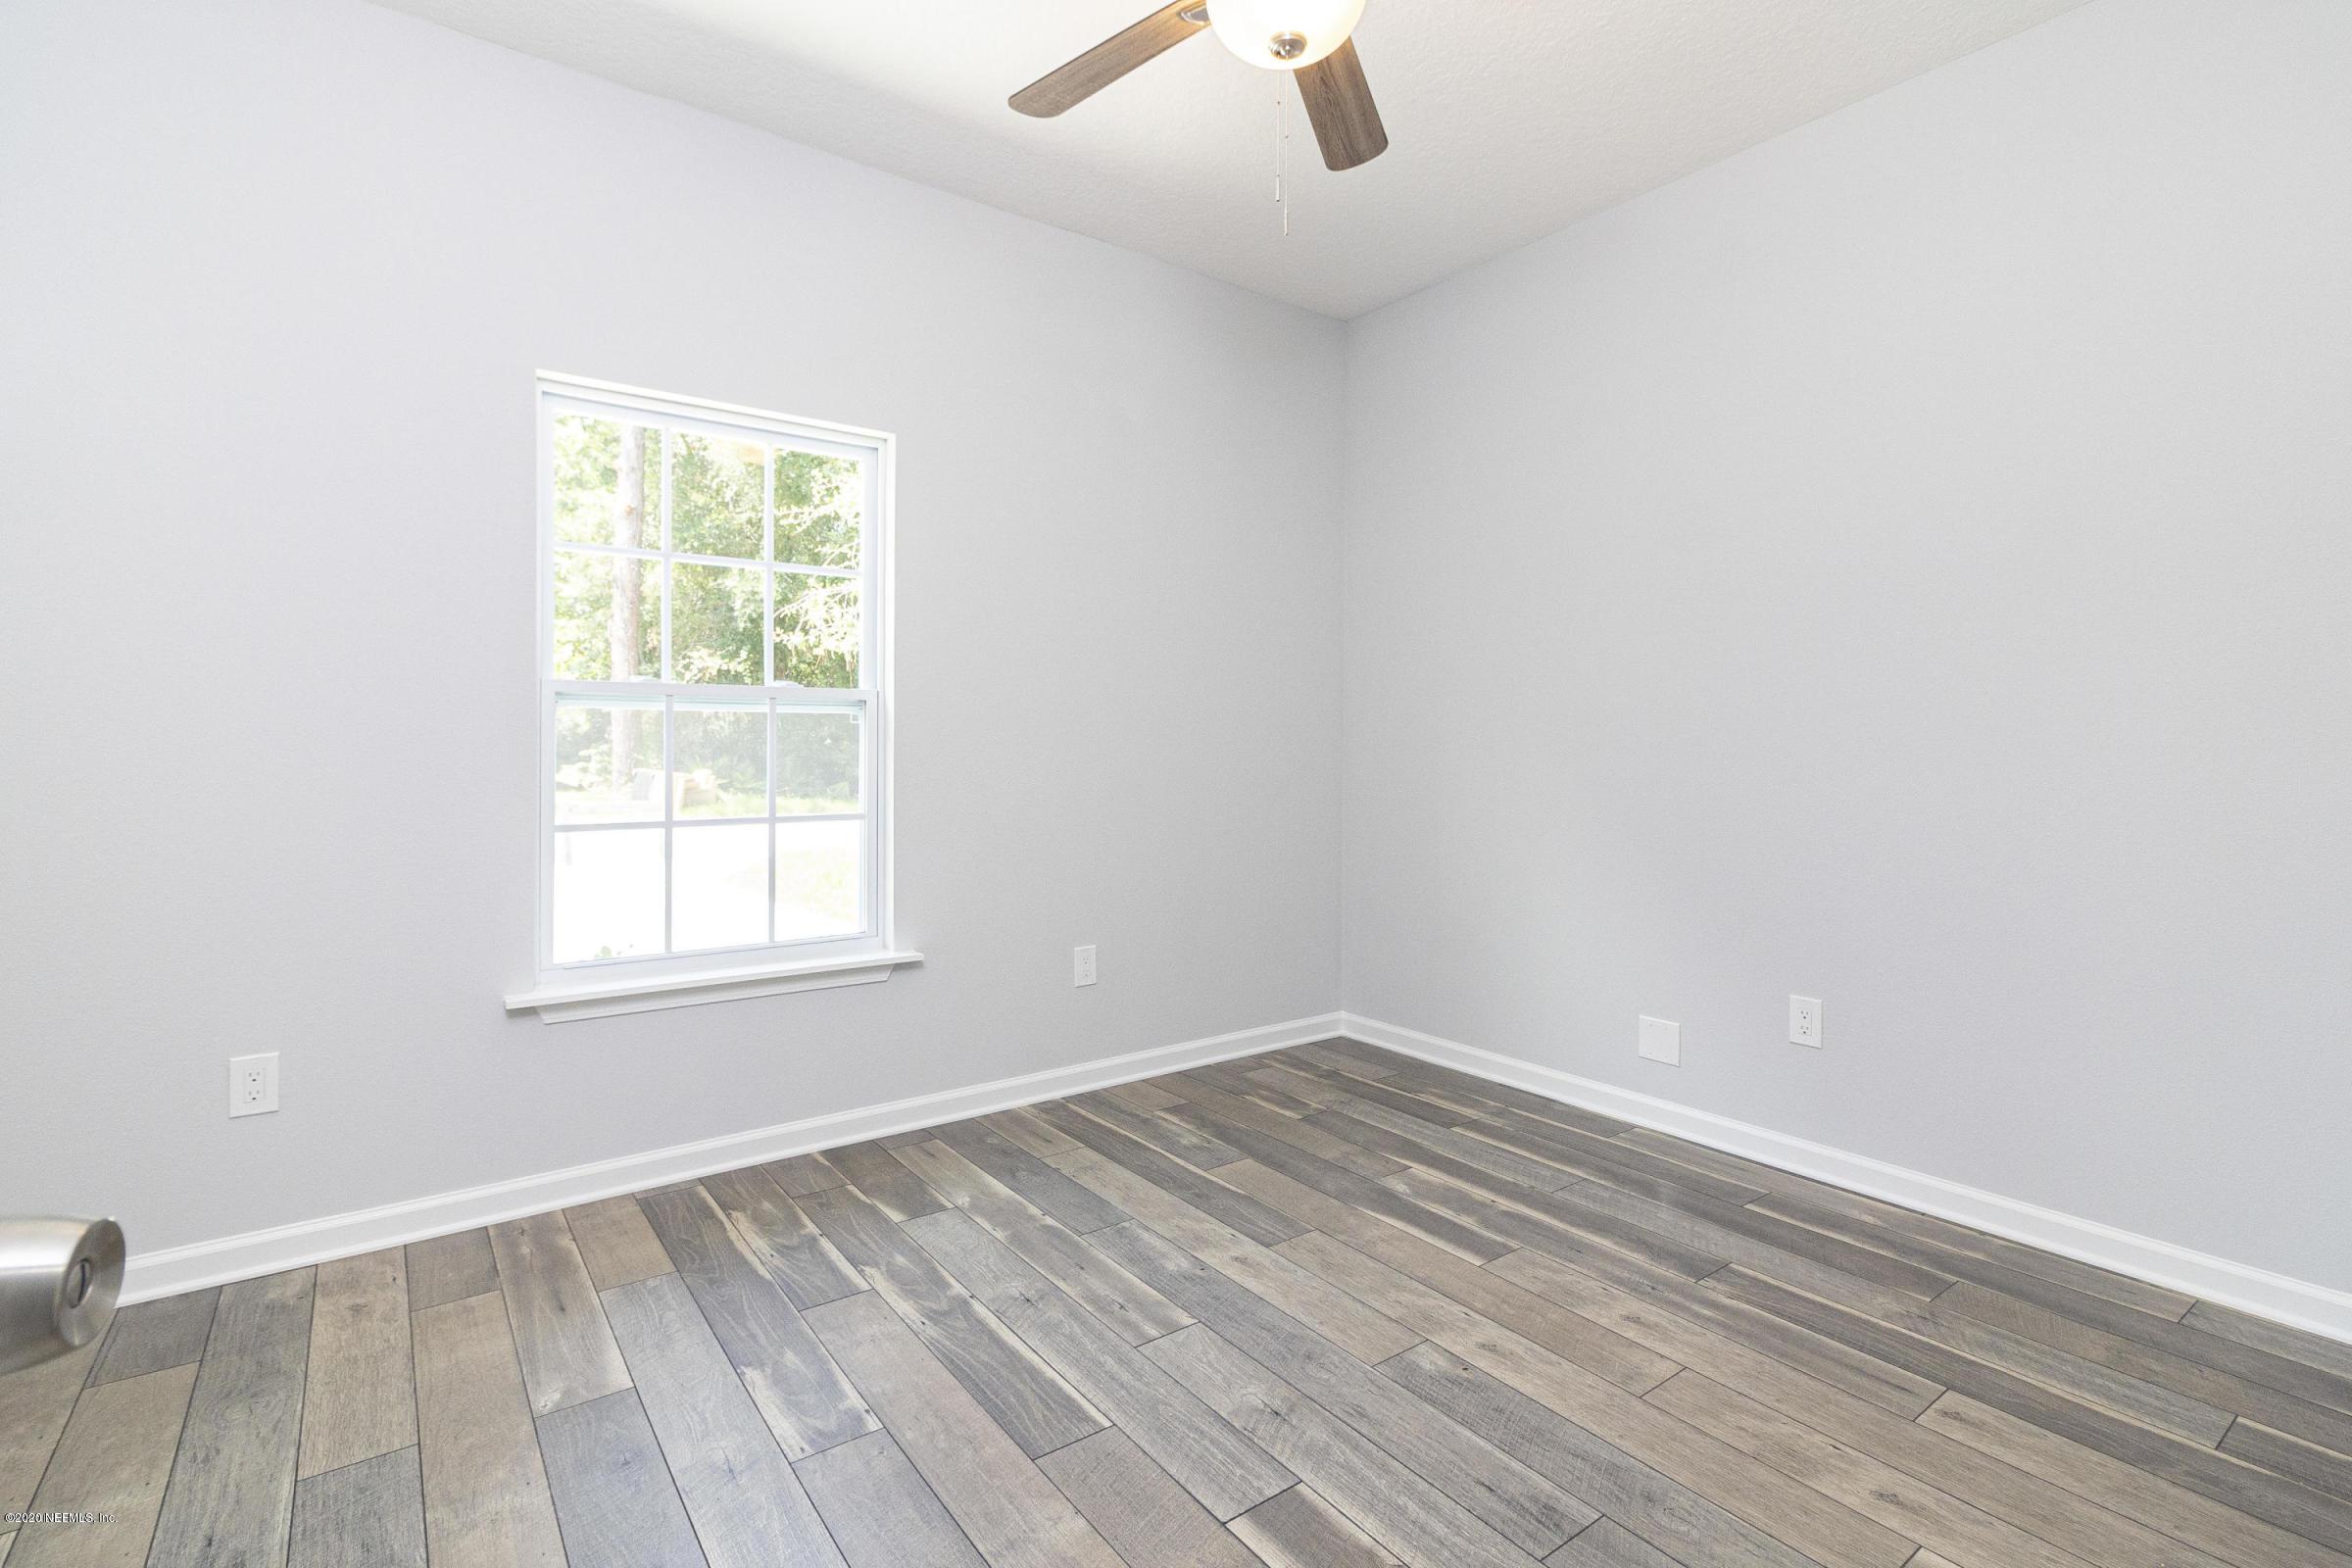 4648 AVENUE D, ST AUGUSTINE, FLORIDA 32095, 2 Bedrooms Bedrooms, ,2 BathroomsBathrooms,Rental,For Rent,AVENUE D,1083279